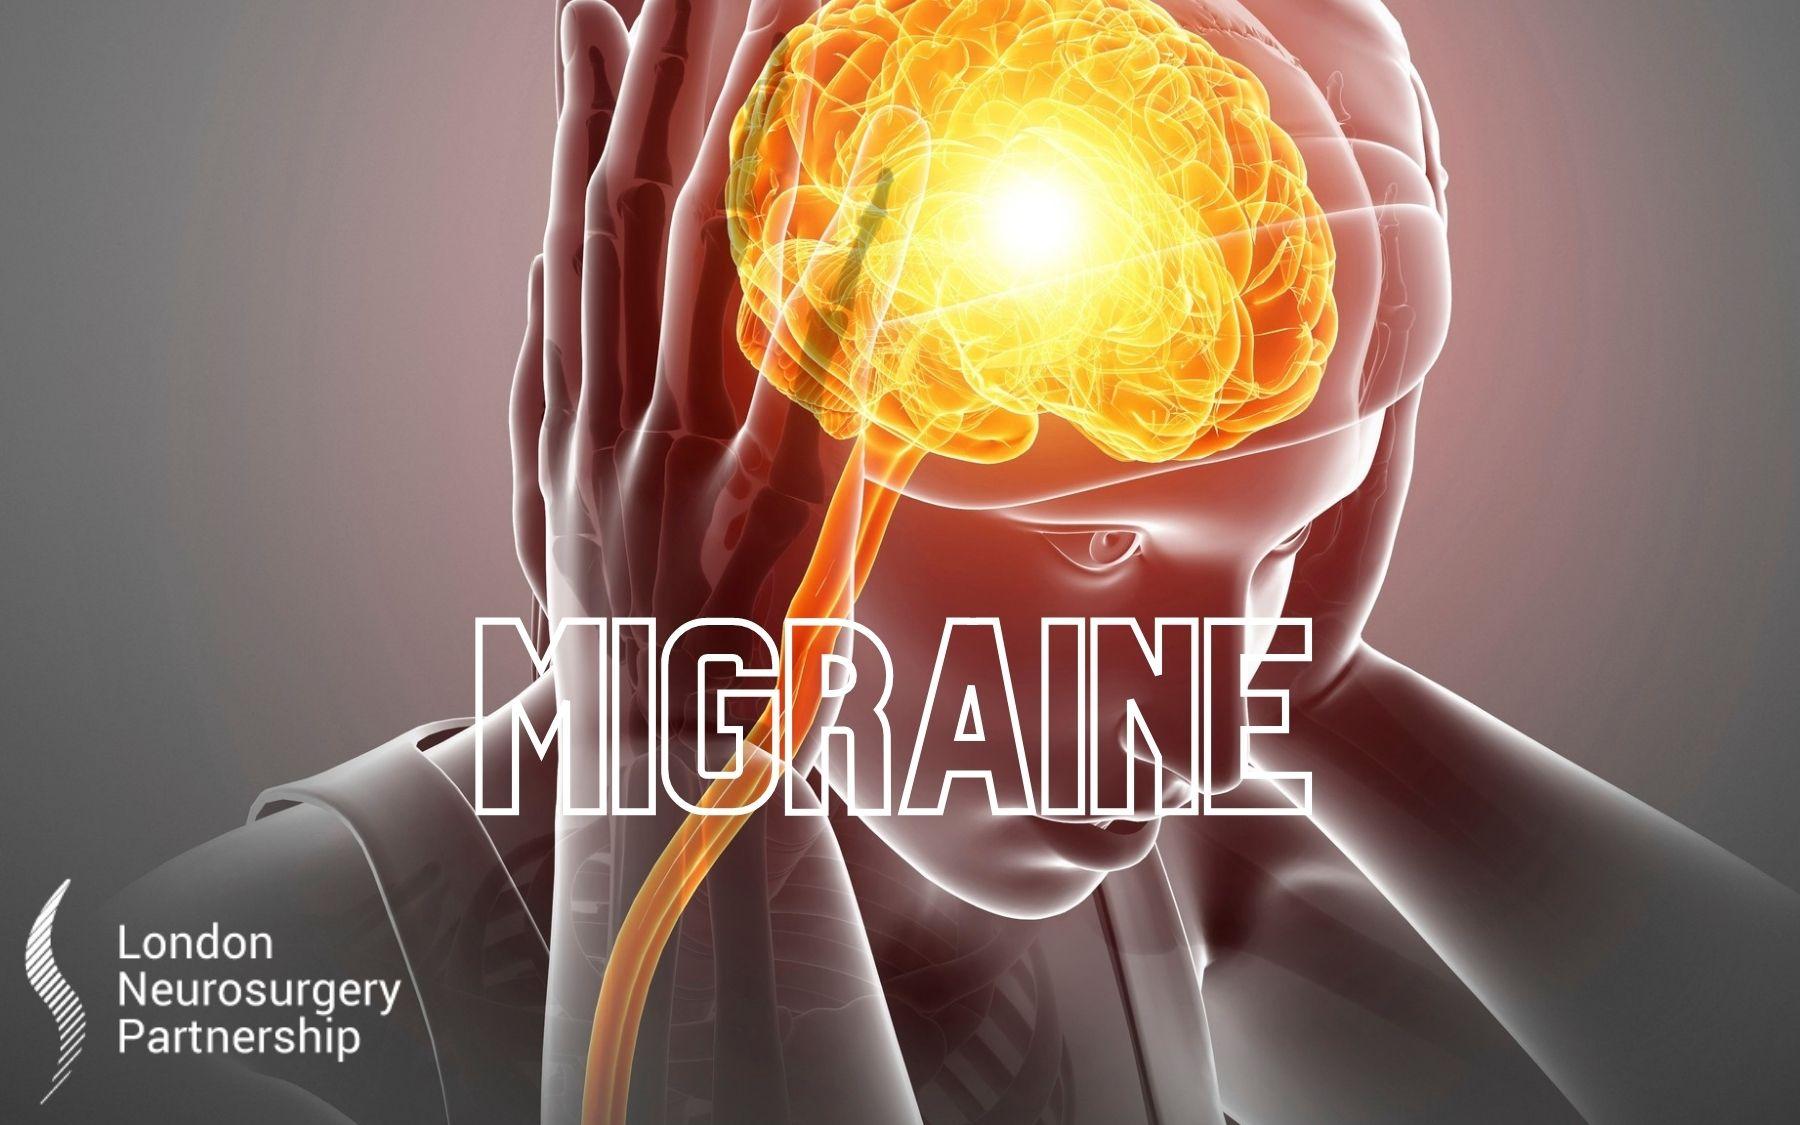 migraine london neurosurgery partnership